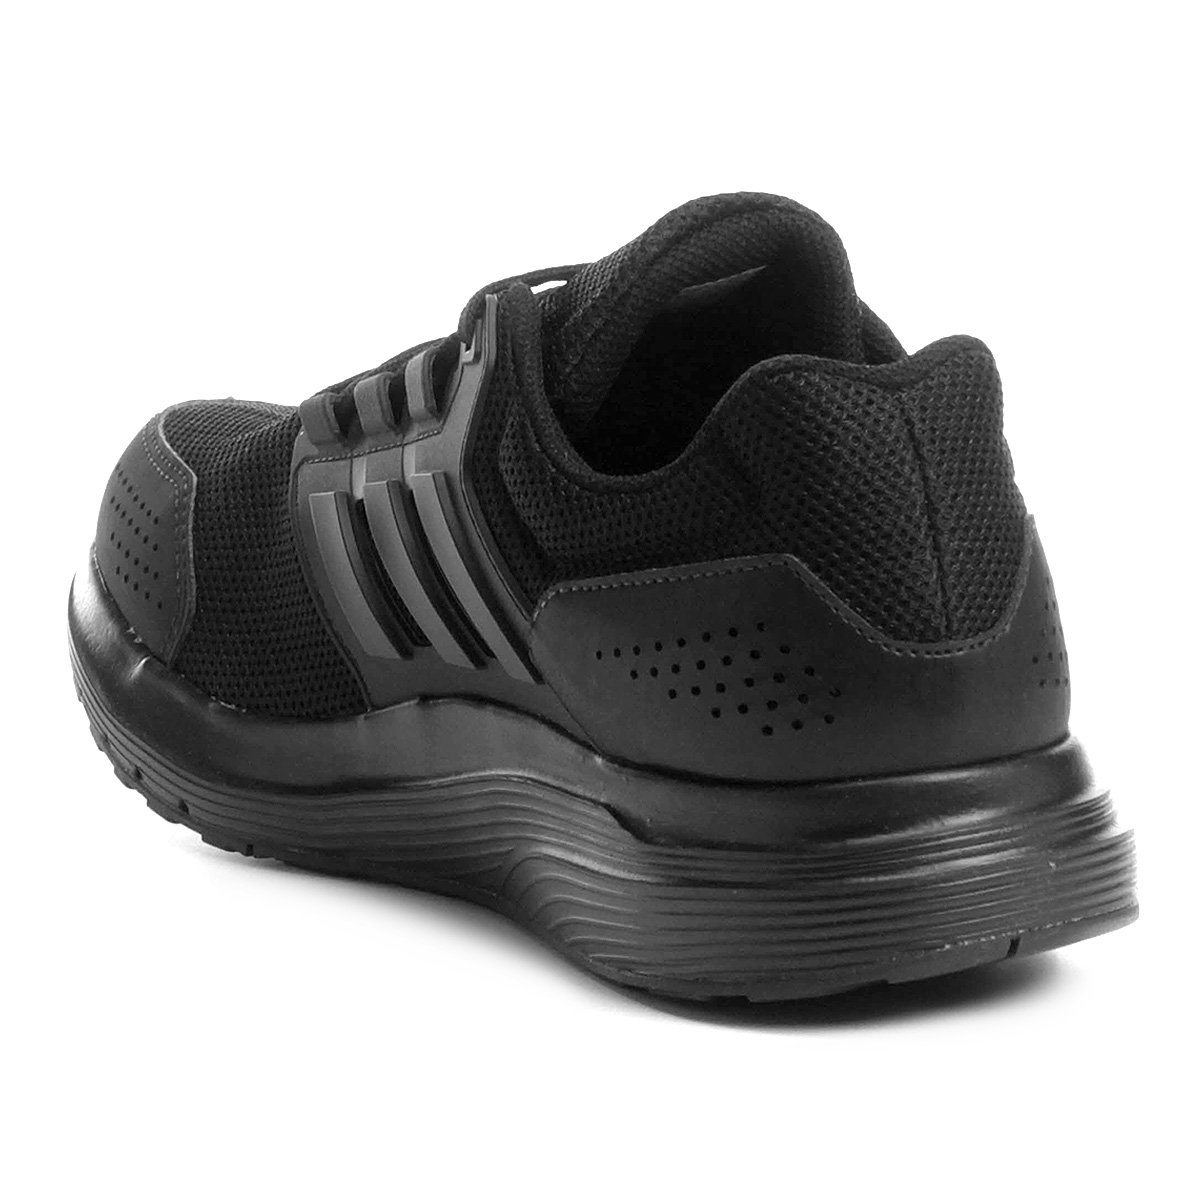 Adidas Tênis 4 4 Masculino Galaxy Preto Preto Tênis Galaxy Tênis Adidas Masculino wOqEF